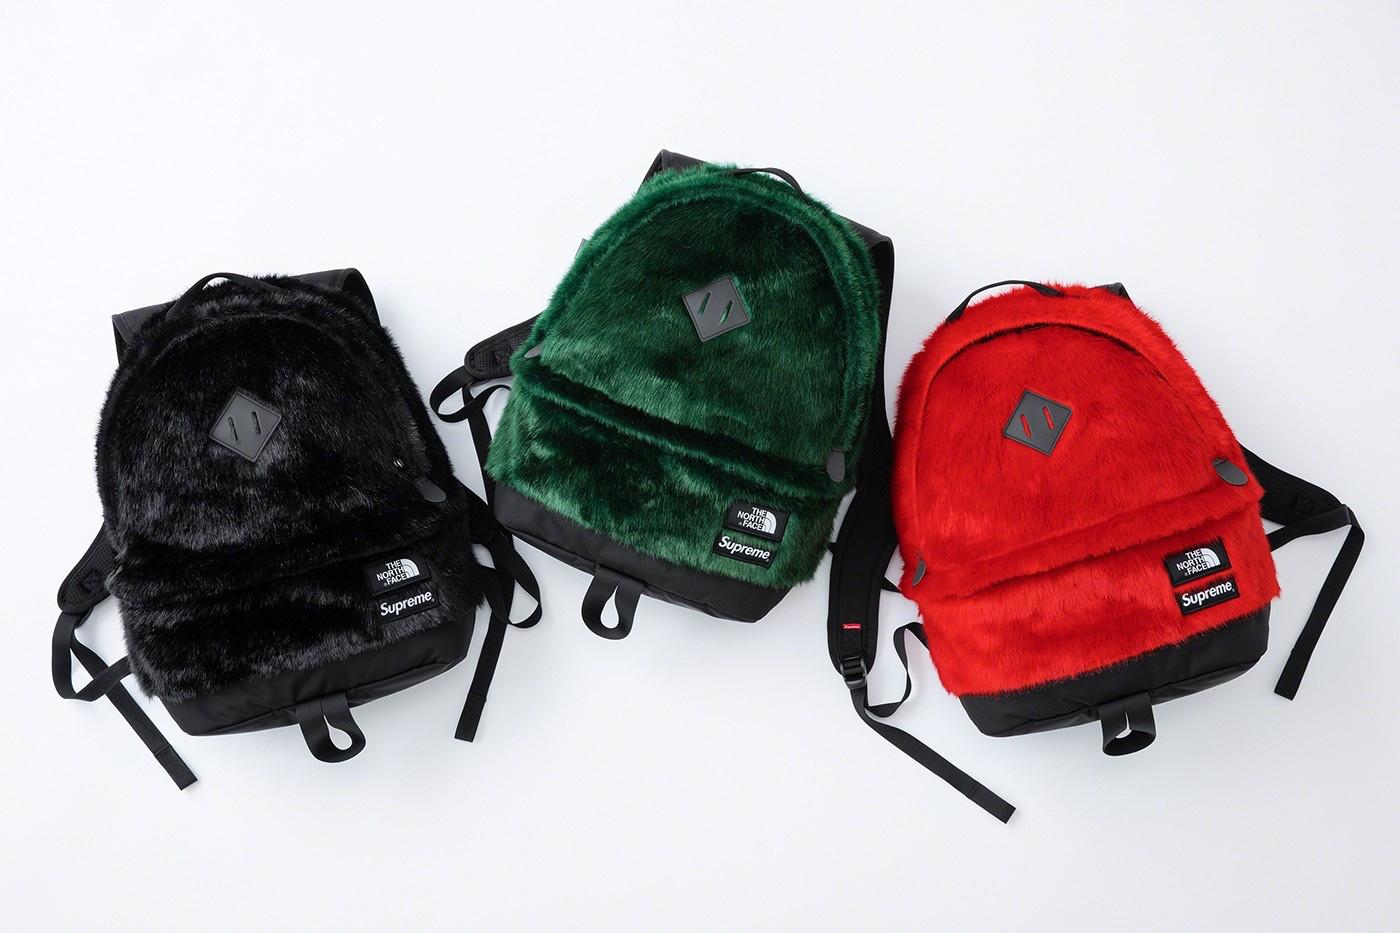 Supreme x The Nort Face Faux Fur Backpack 25L